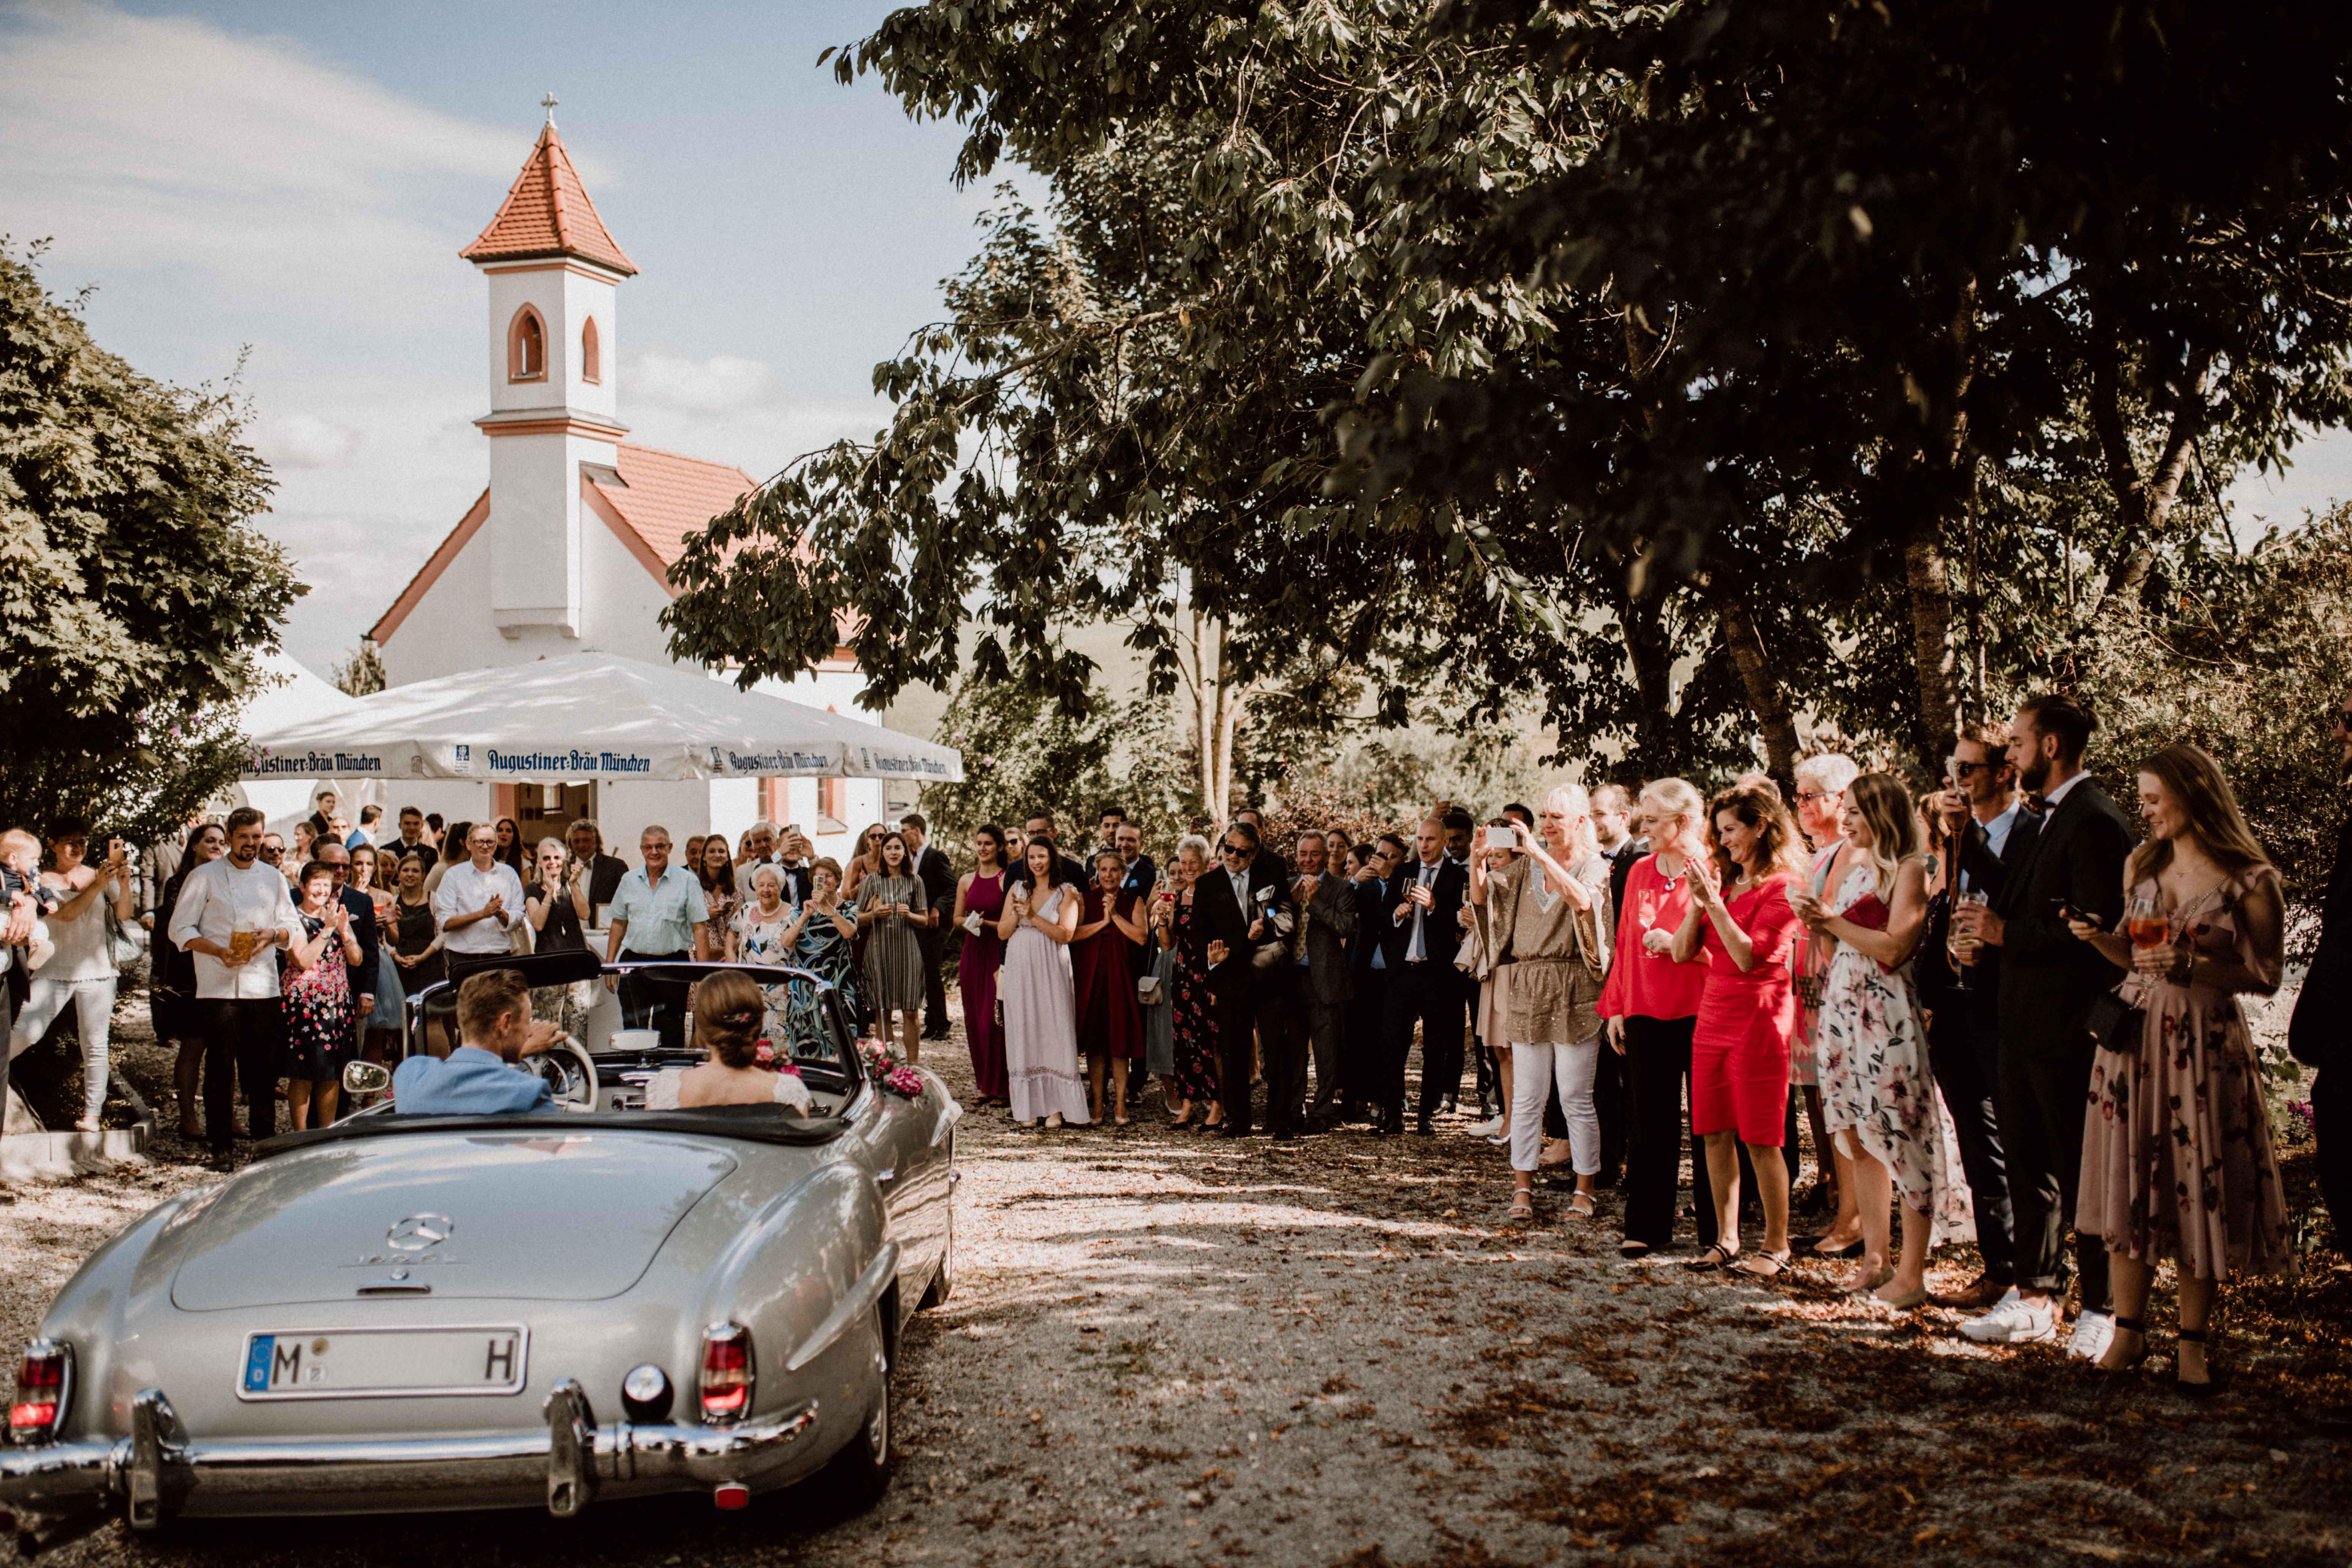 empfang publikum sonja poehlmann photography couples muenchen bayern